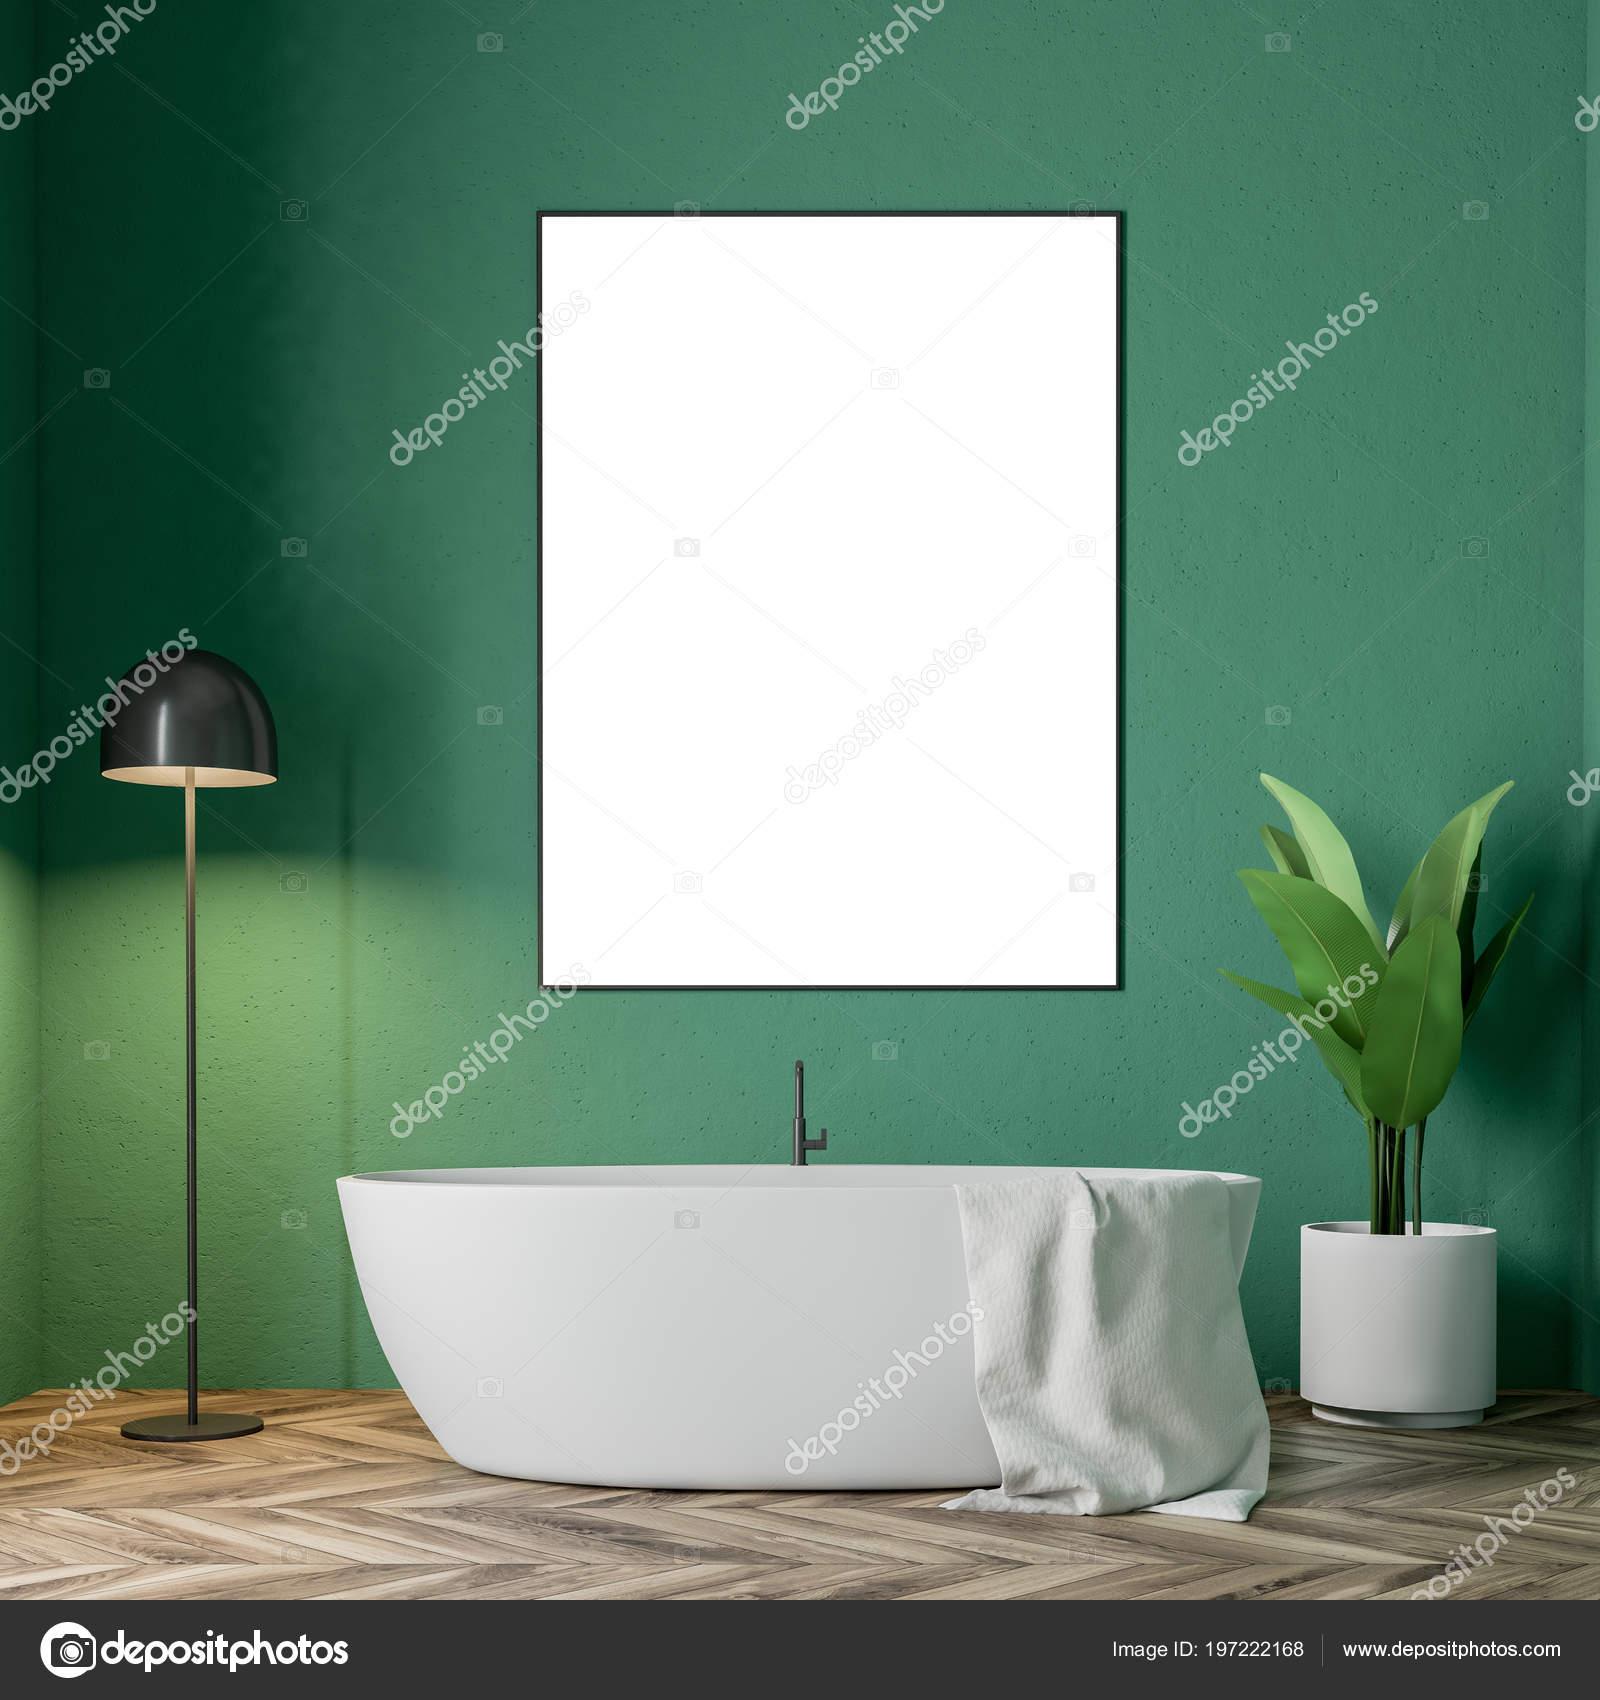 Minimalistic Green Bathroom Interior White Bathtub Towel Hanging ...